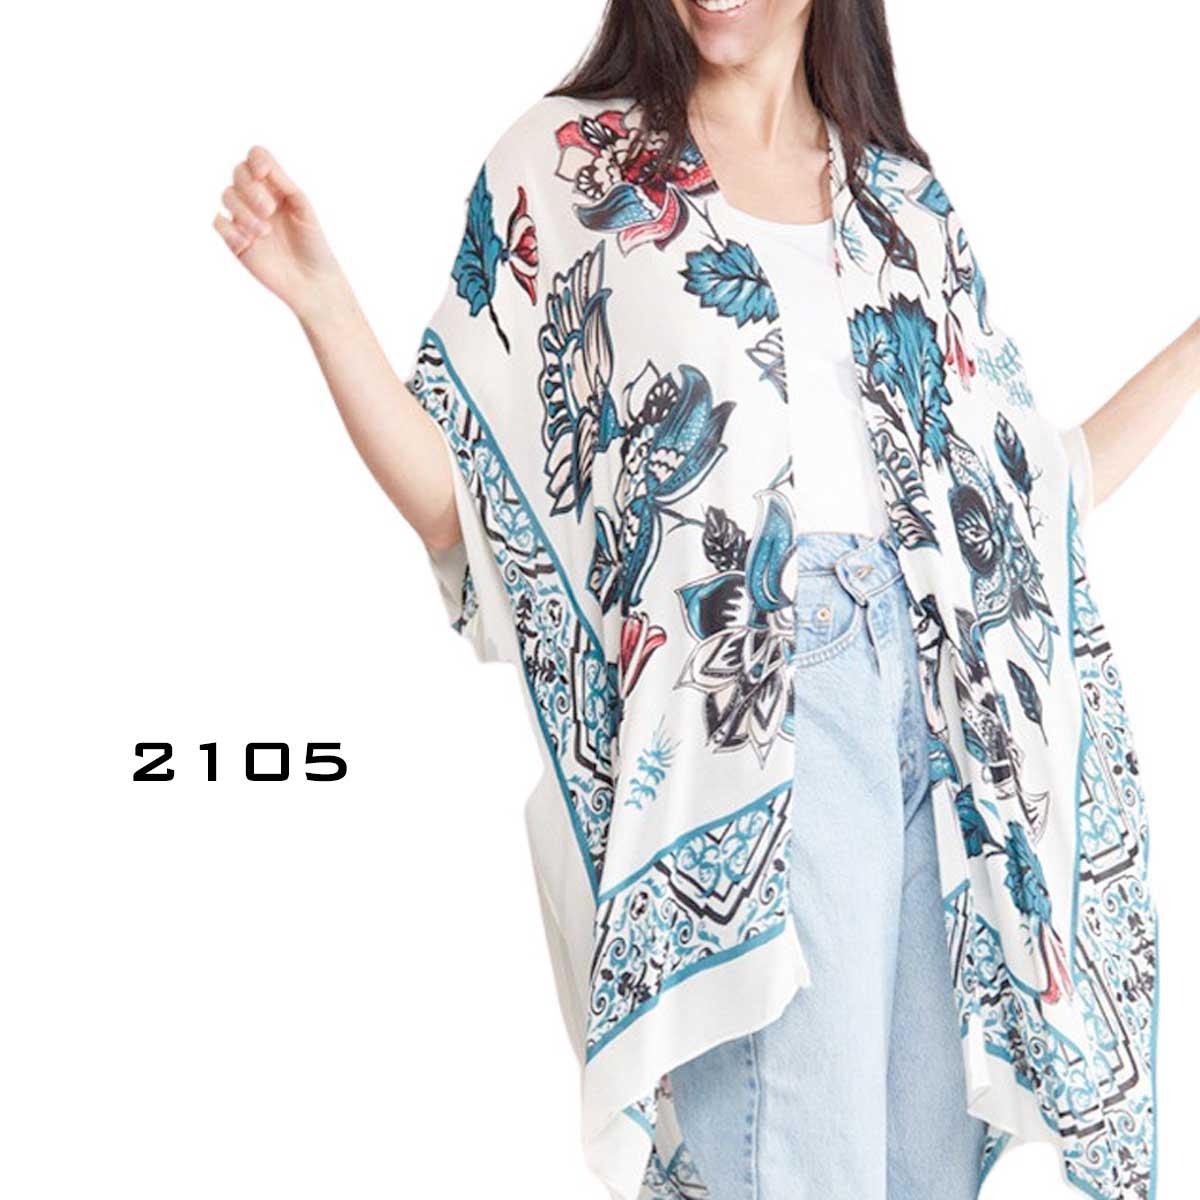 Kimono - Prints 2105